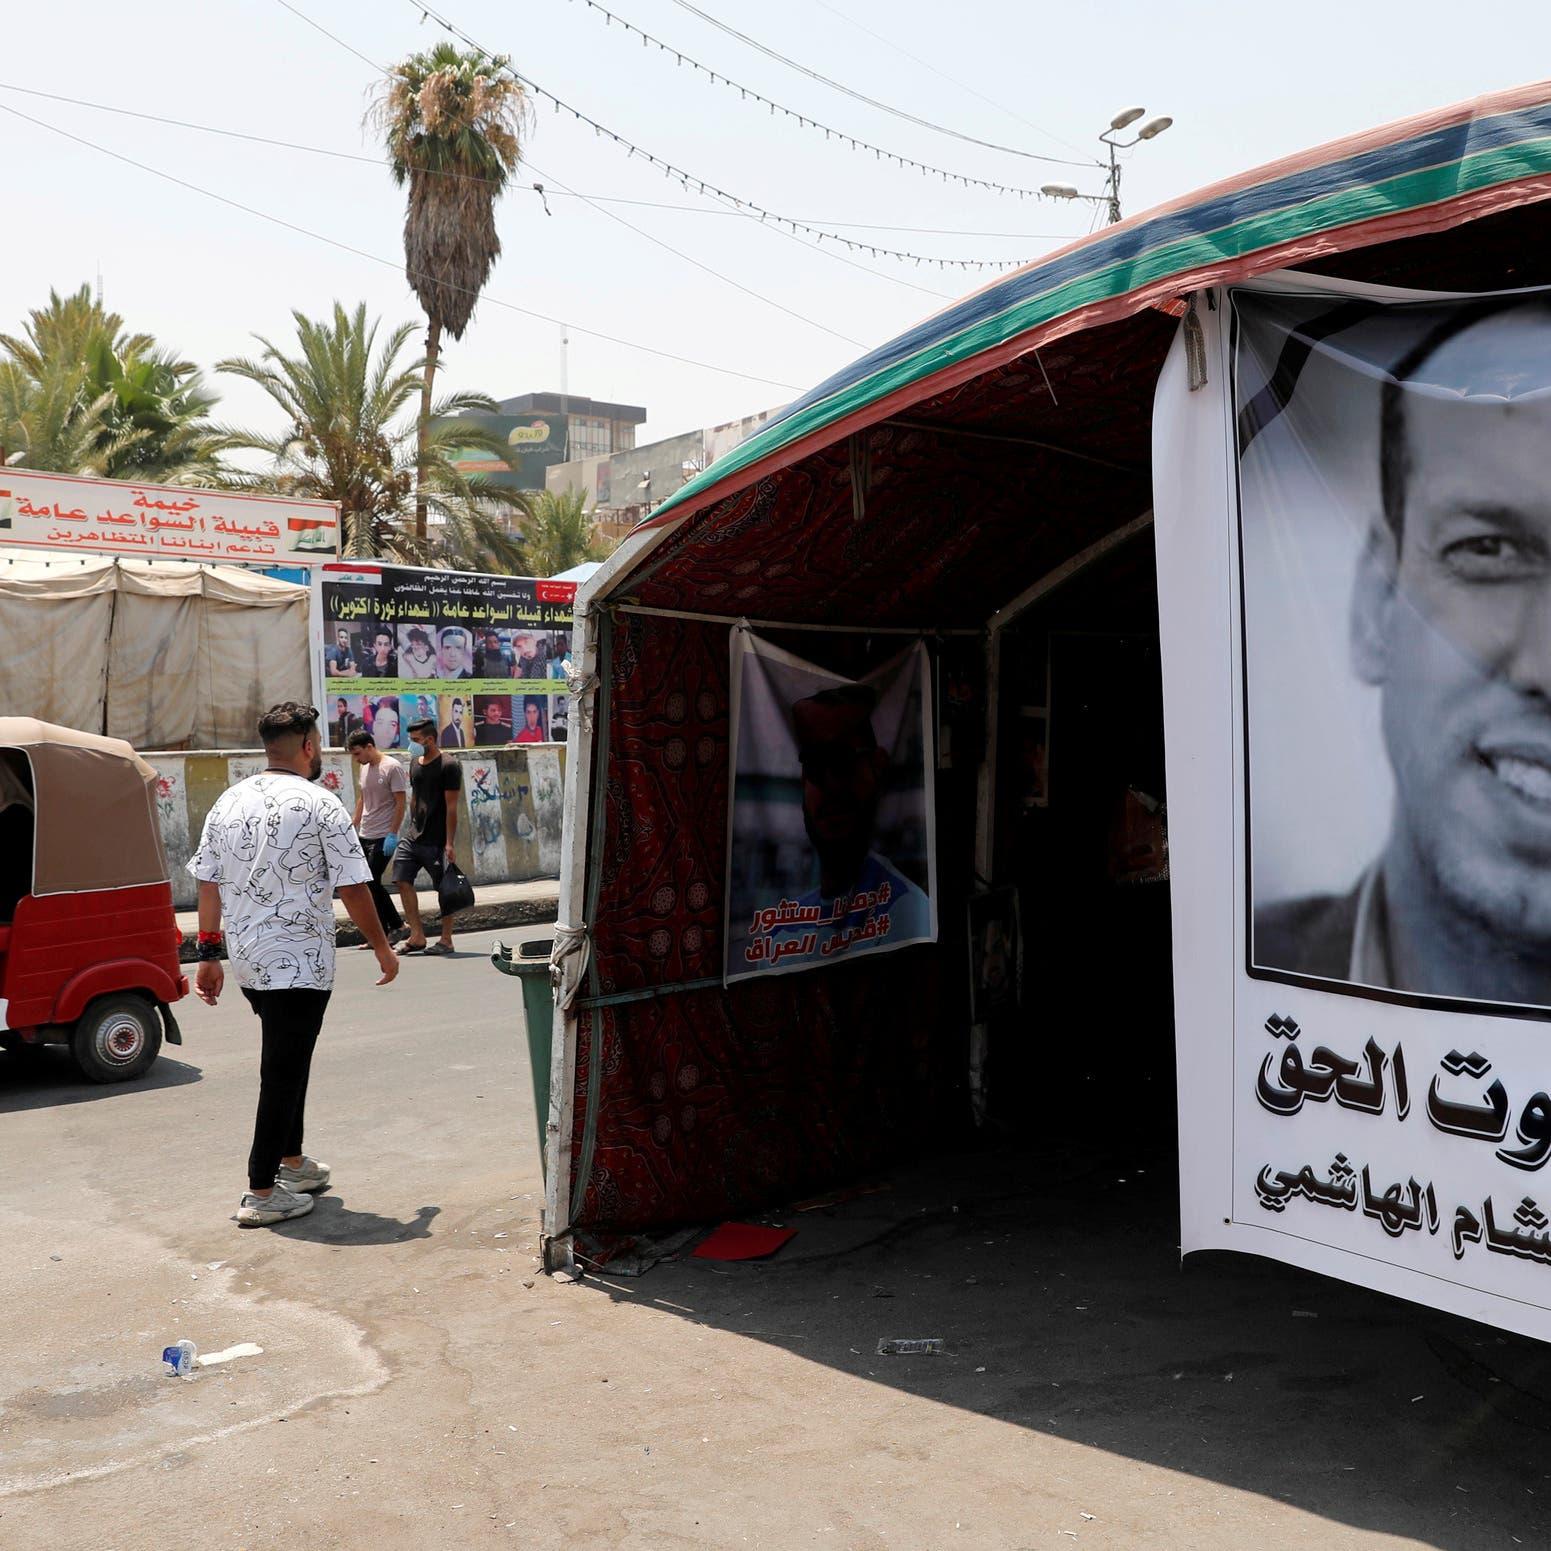 Secret documents may be reason behind Iraqi activist al-Hashemi's assassination